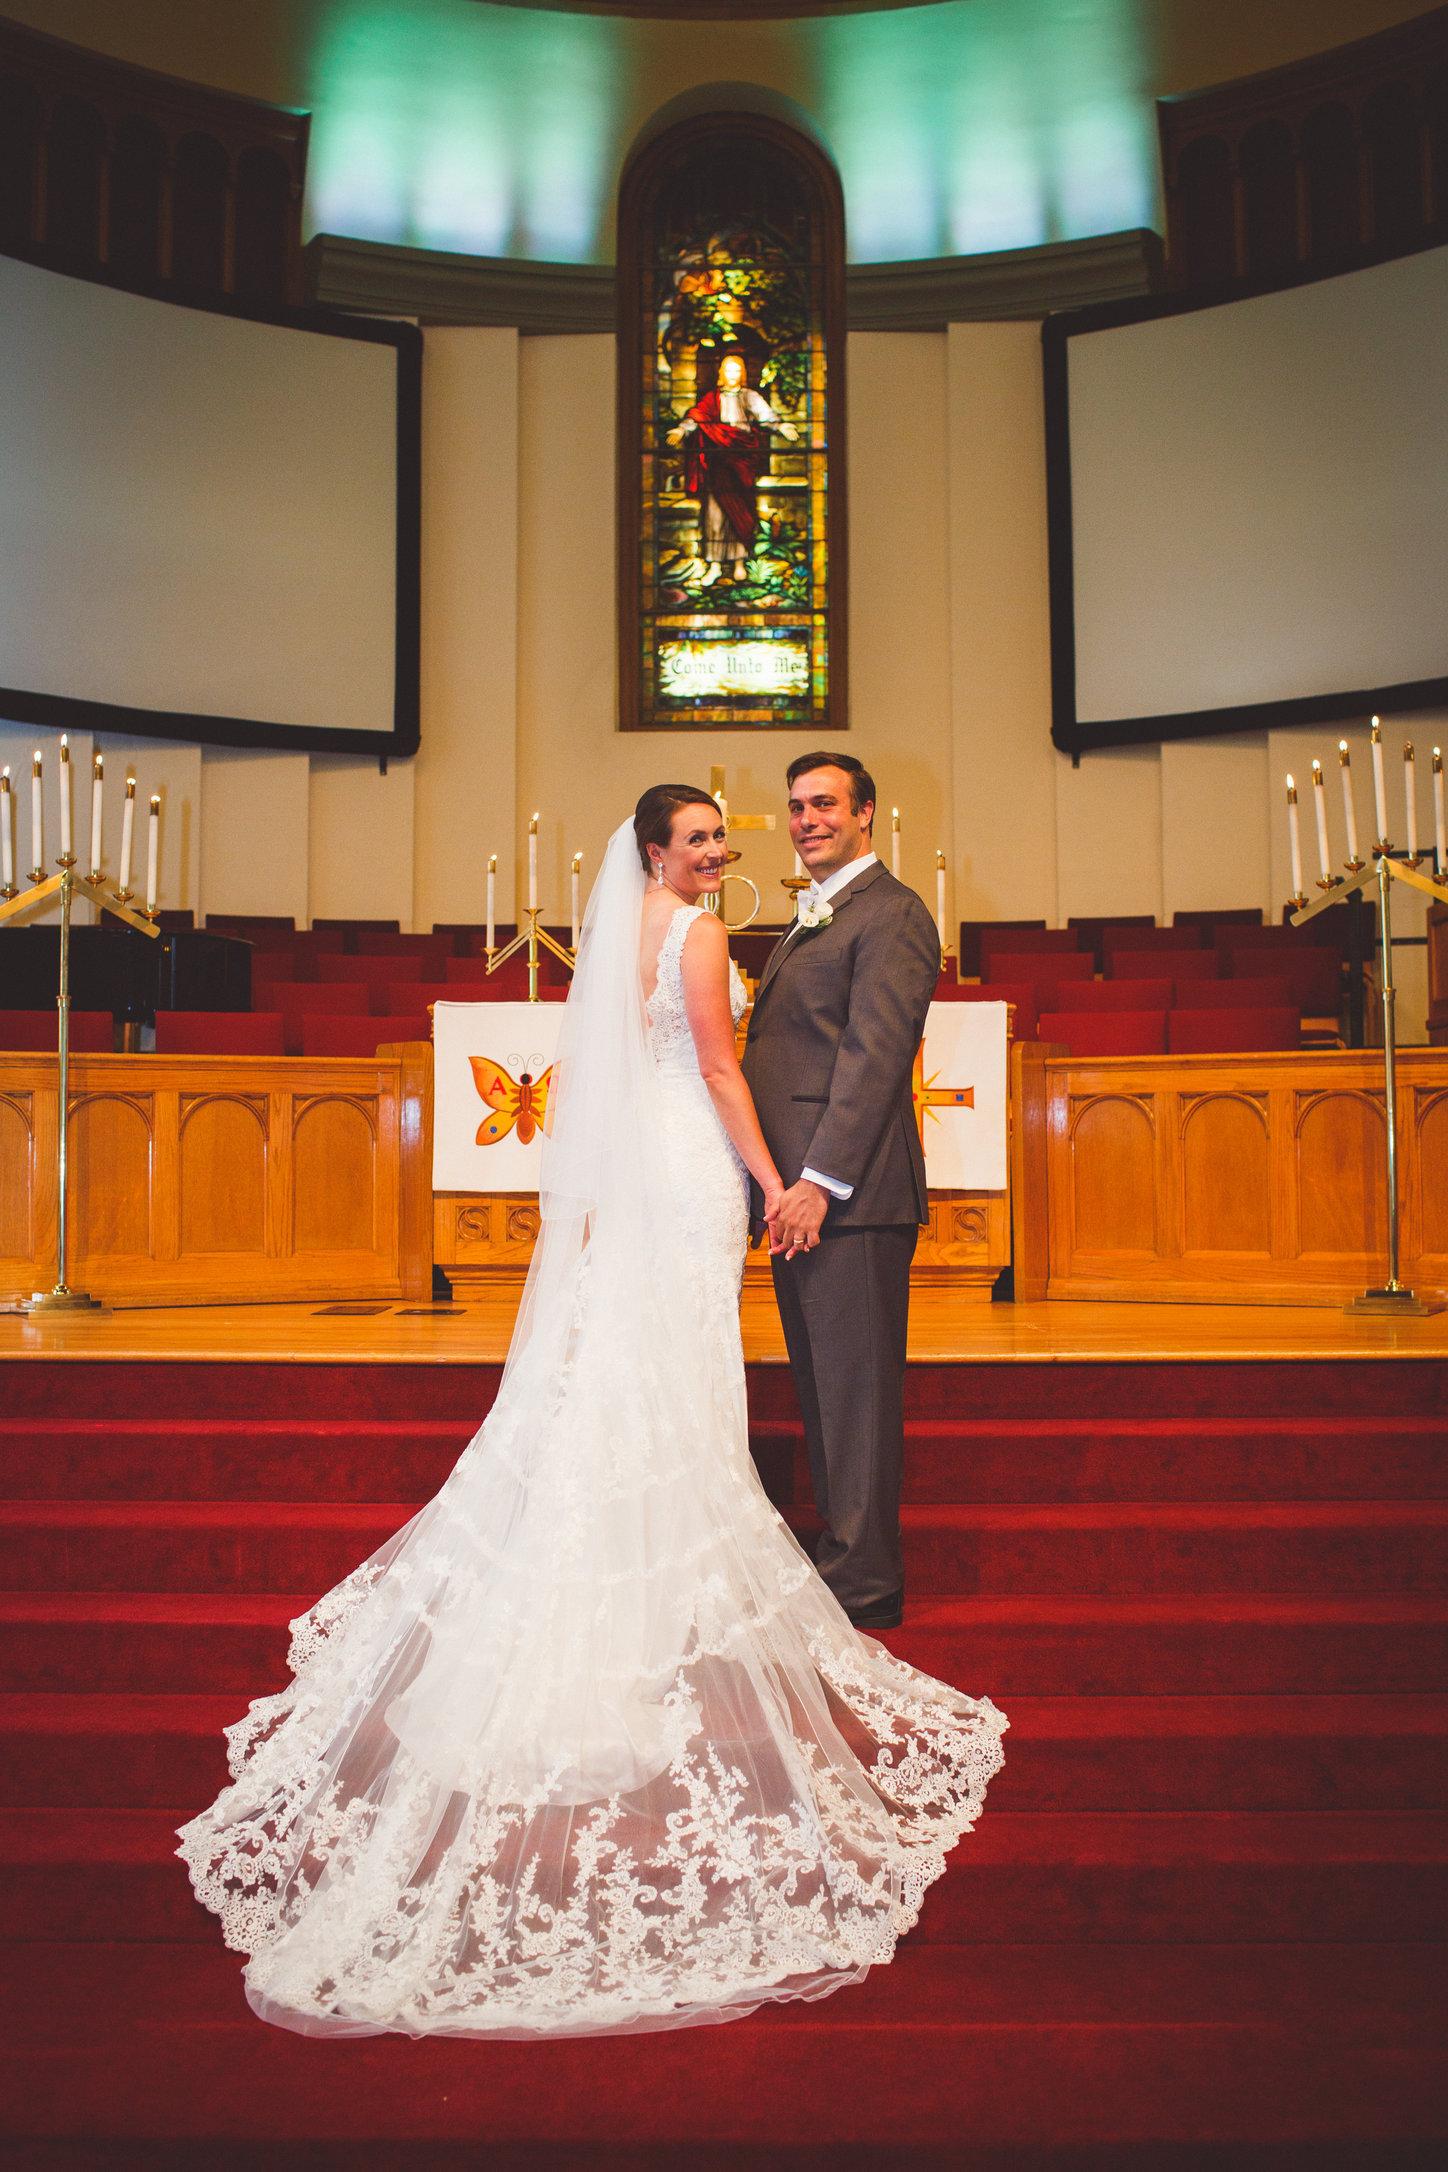 SandC-wedding-294.jpg